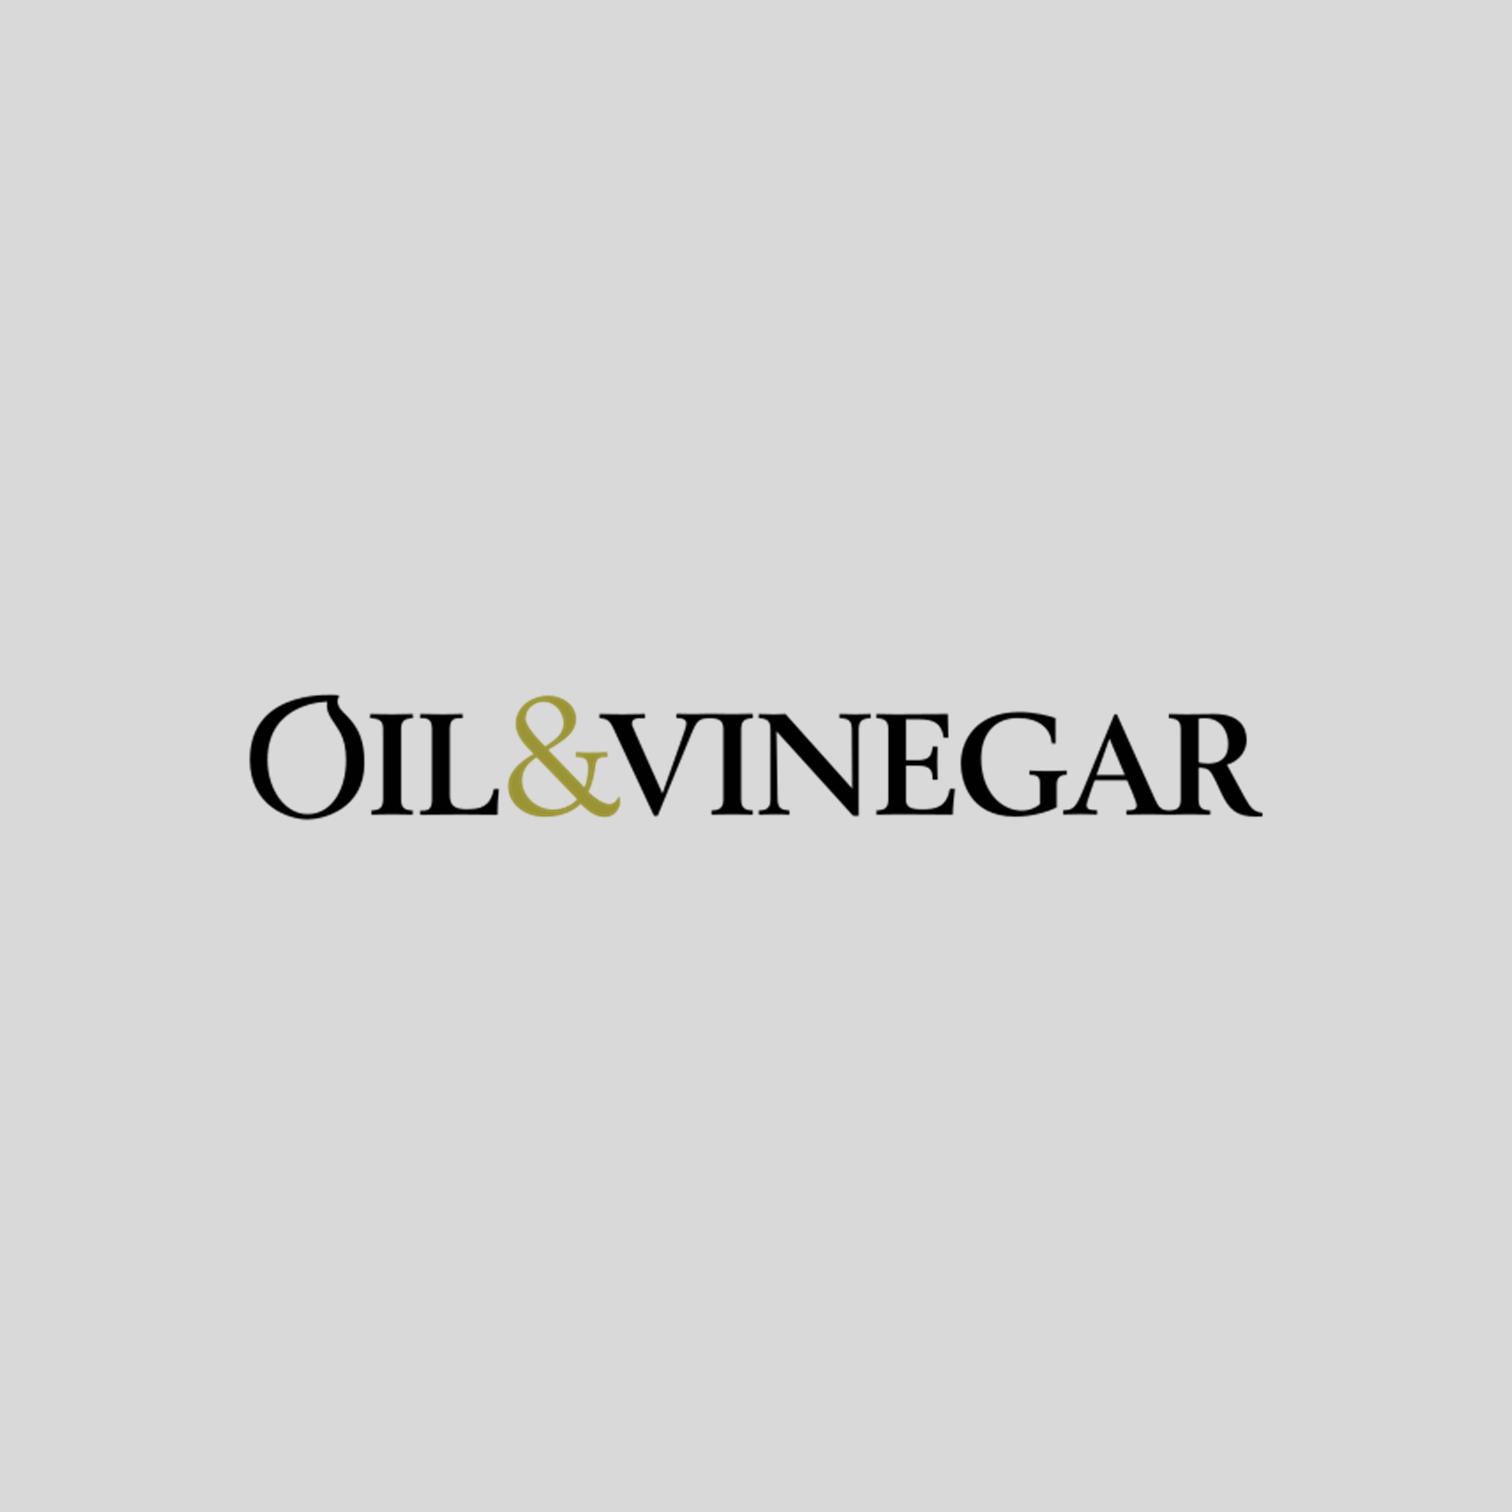 EXPLORING THE WORLD OF OIL & VINEGAR CLASS 1